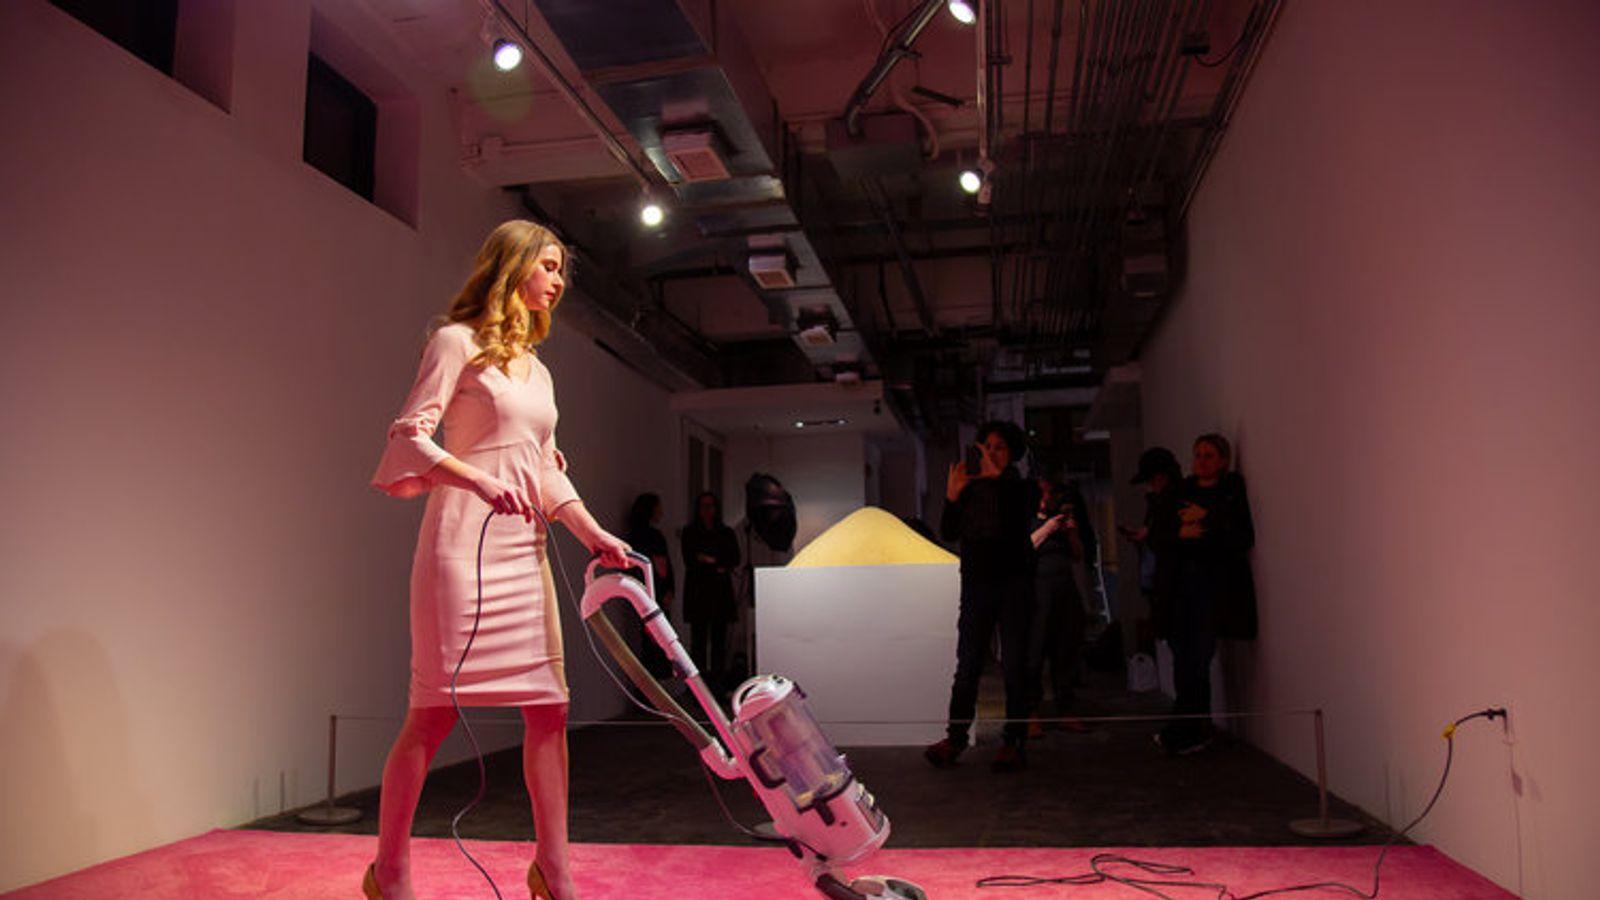 Ivanka Trump Criticises Sexist Artwork Featuring